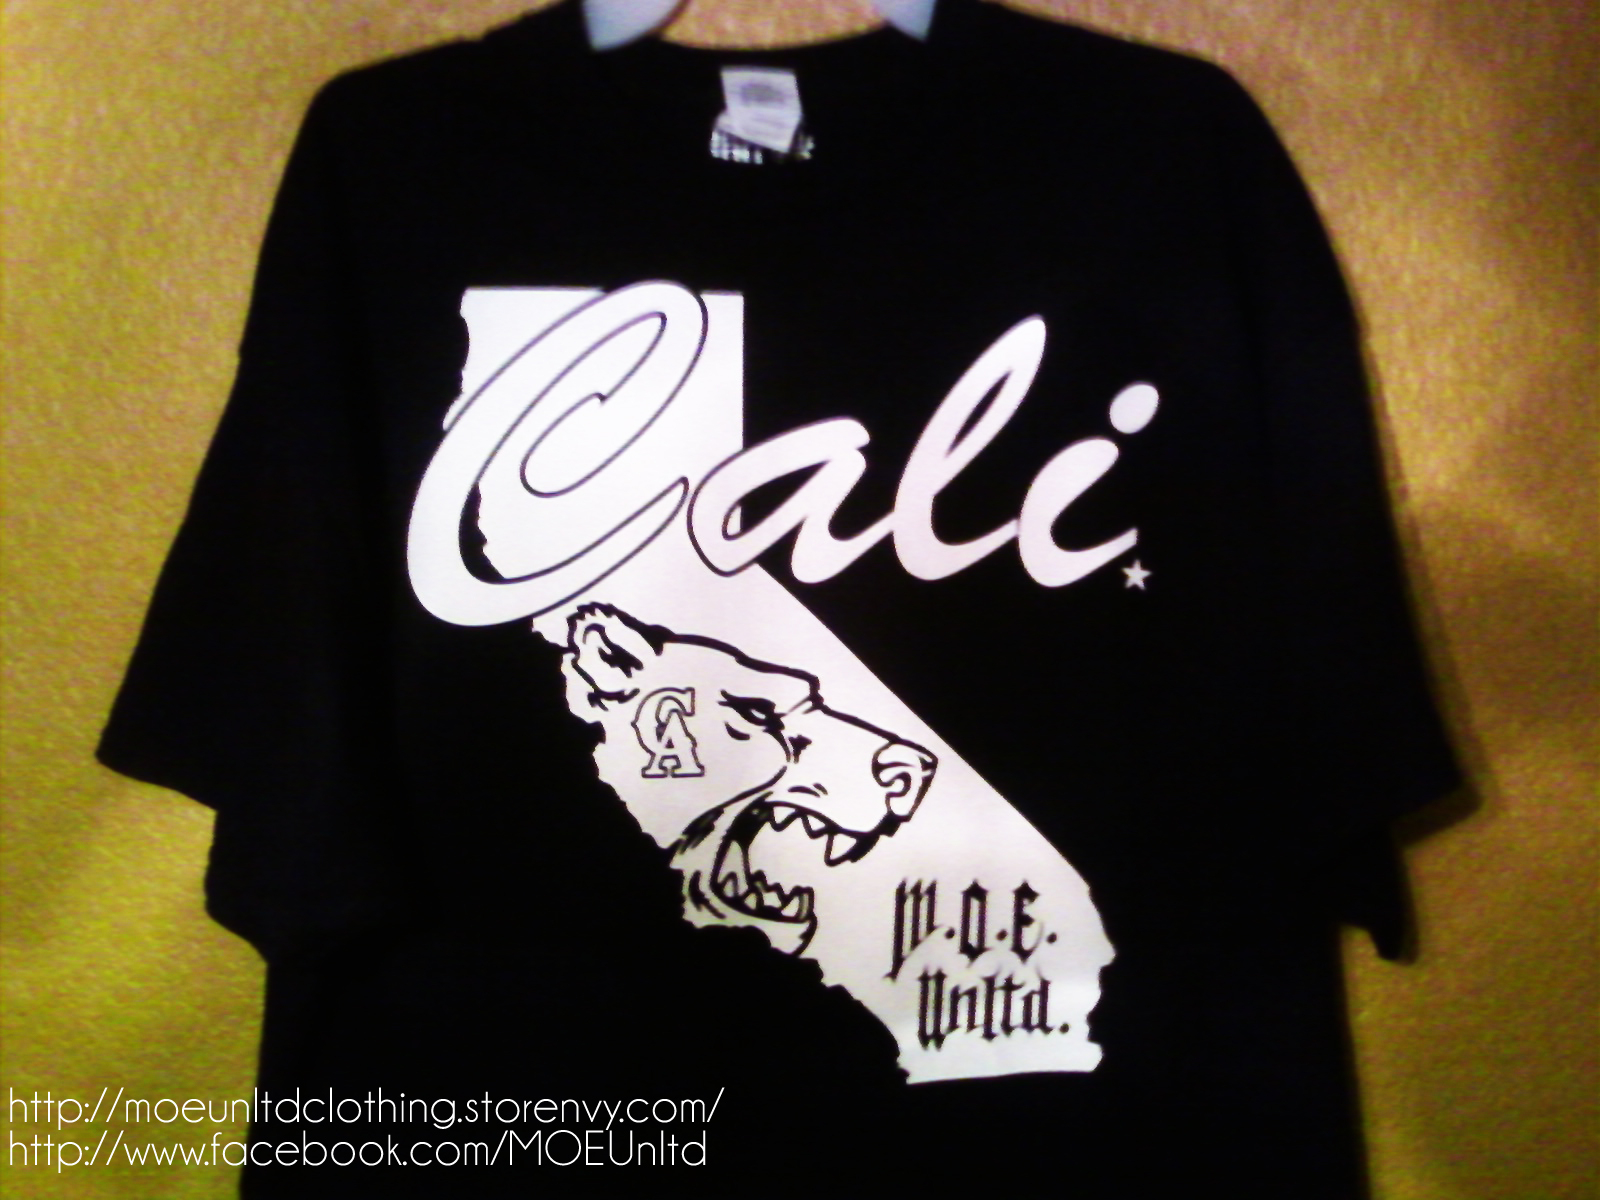 M.o.e. Unltd. Clothing   Cali Men's Black/white T-Shirt 2Xl-5Xl - California Map Shirt